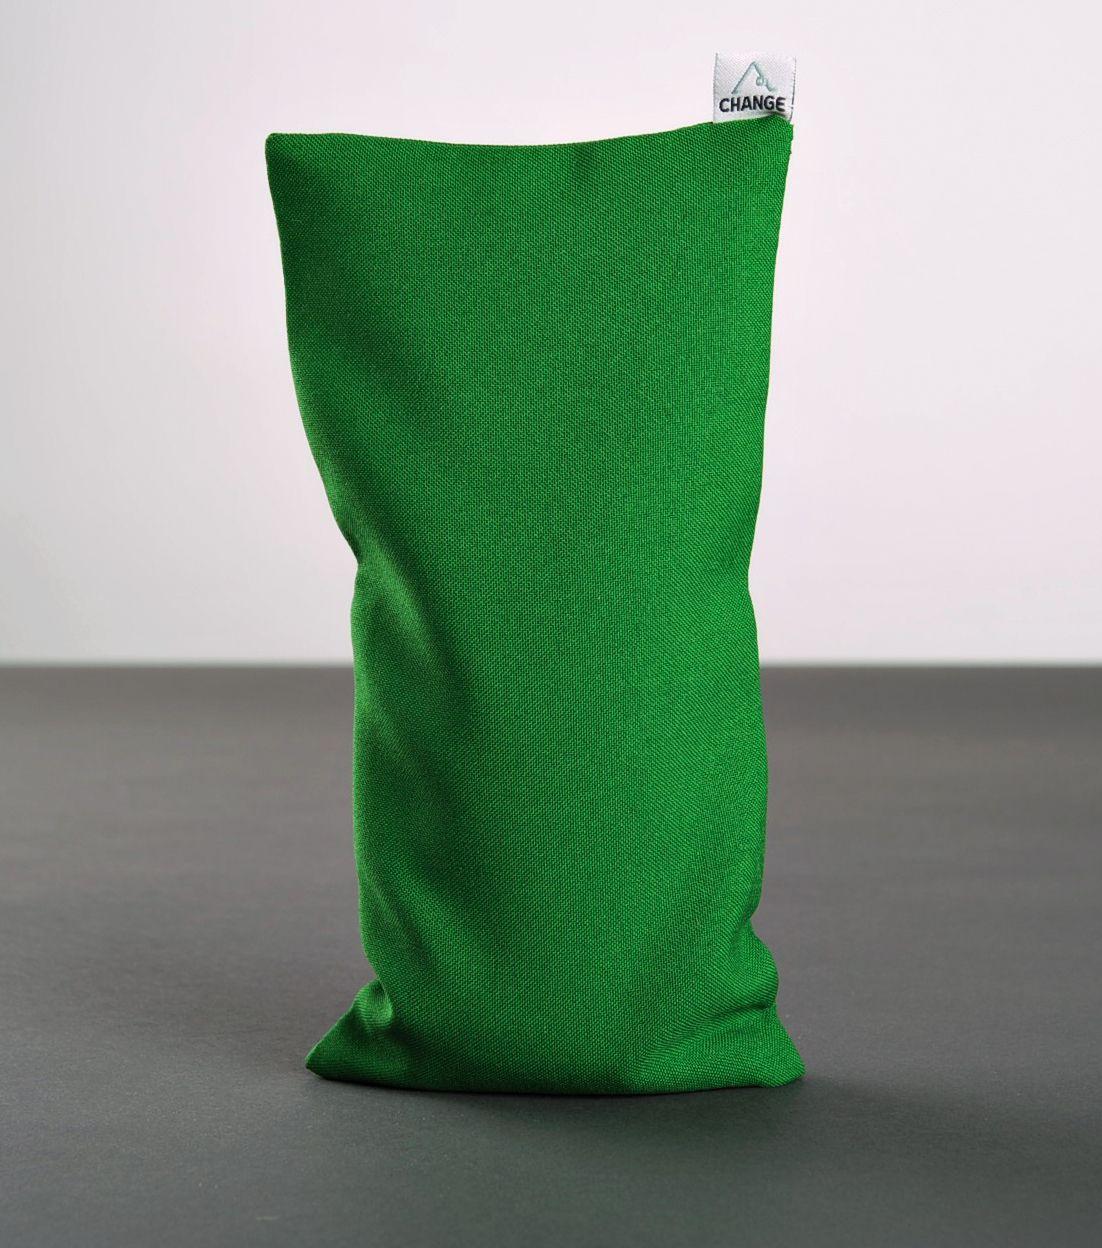 Orthopedic pillow for yoga photo 4